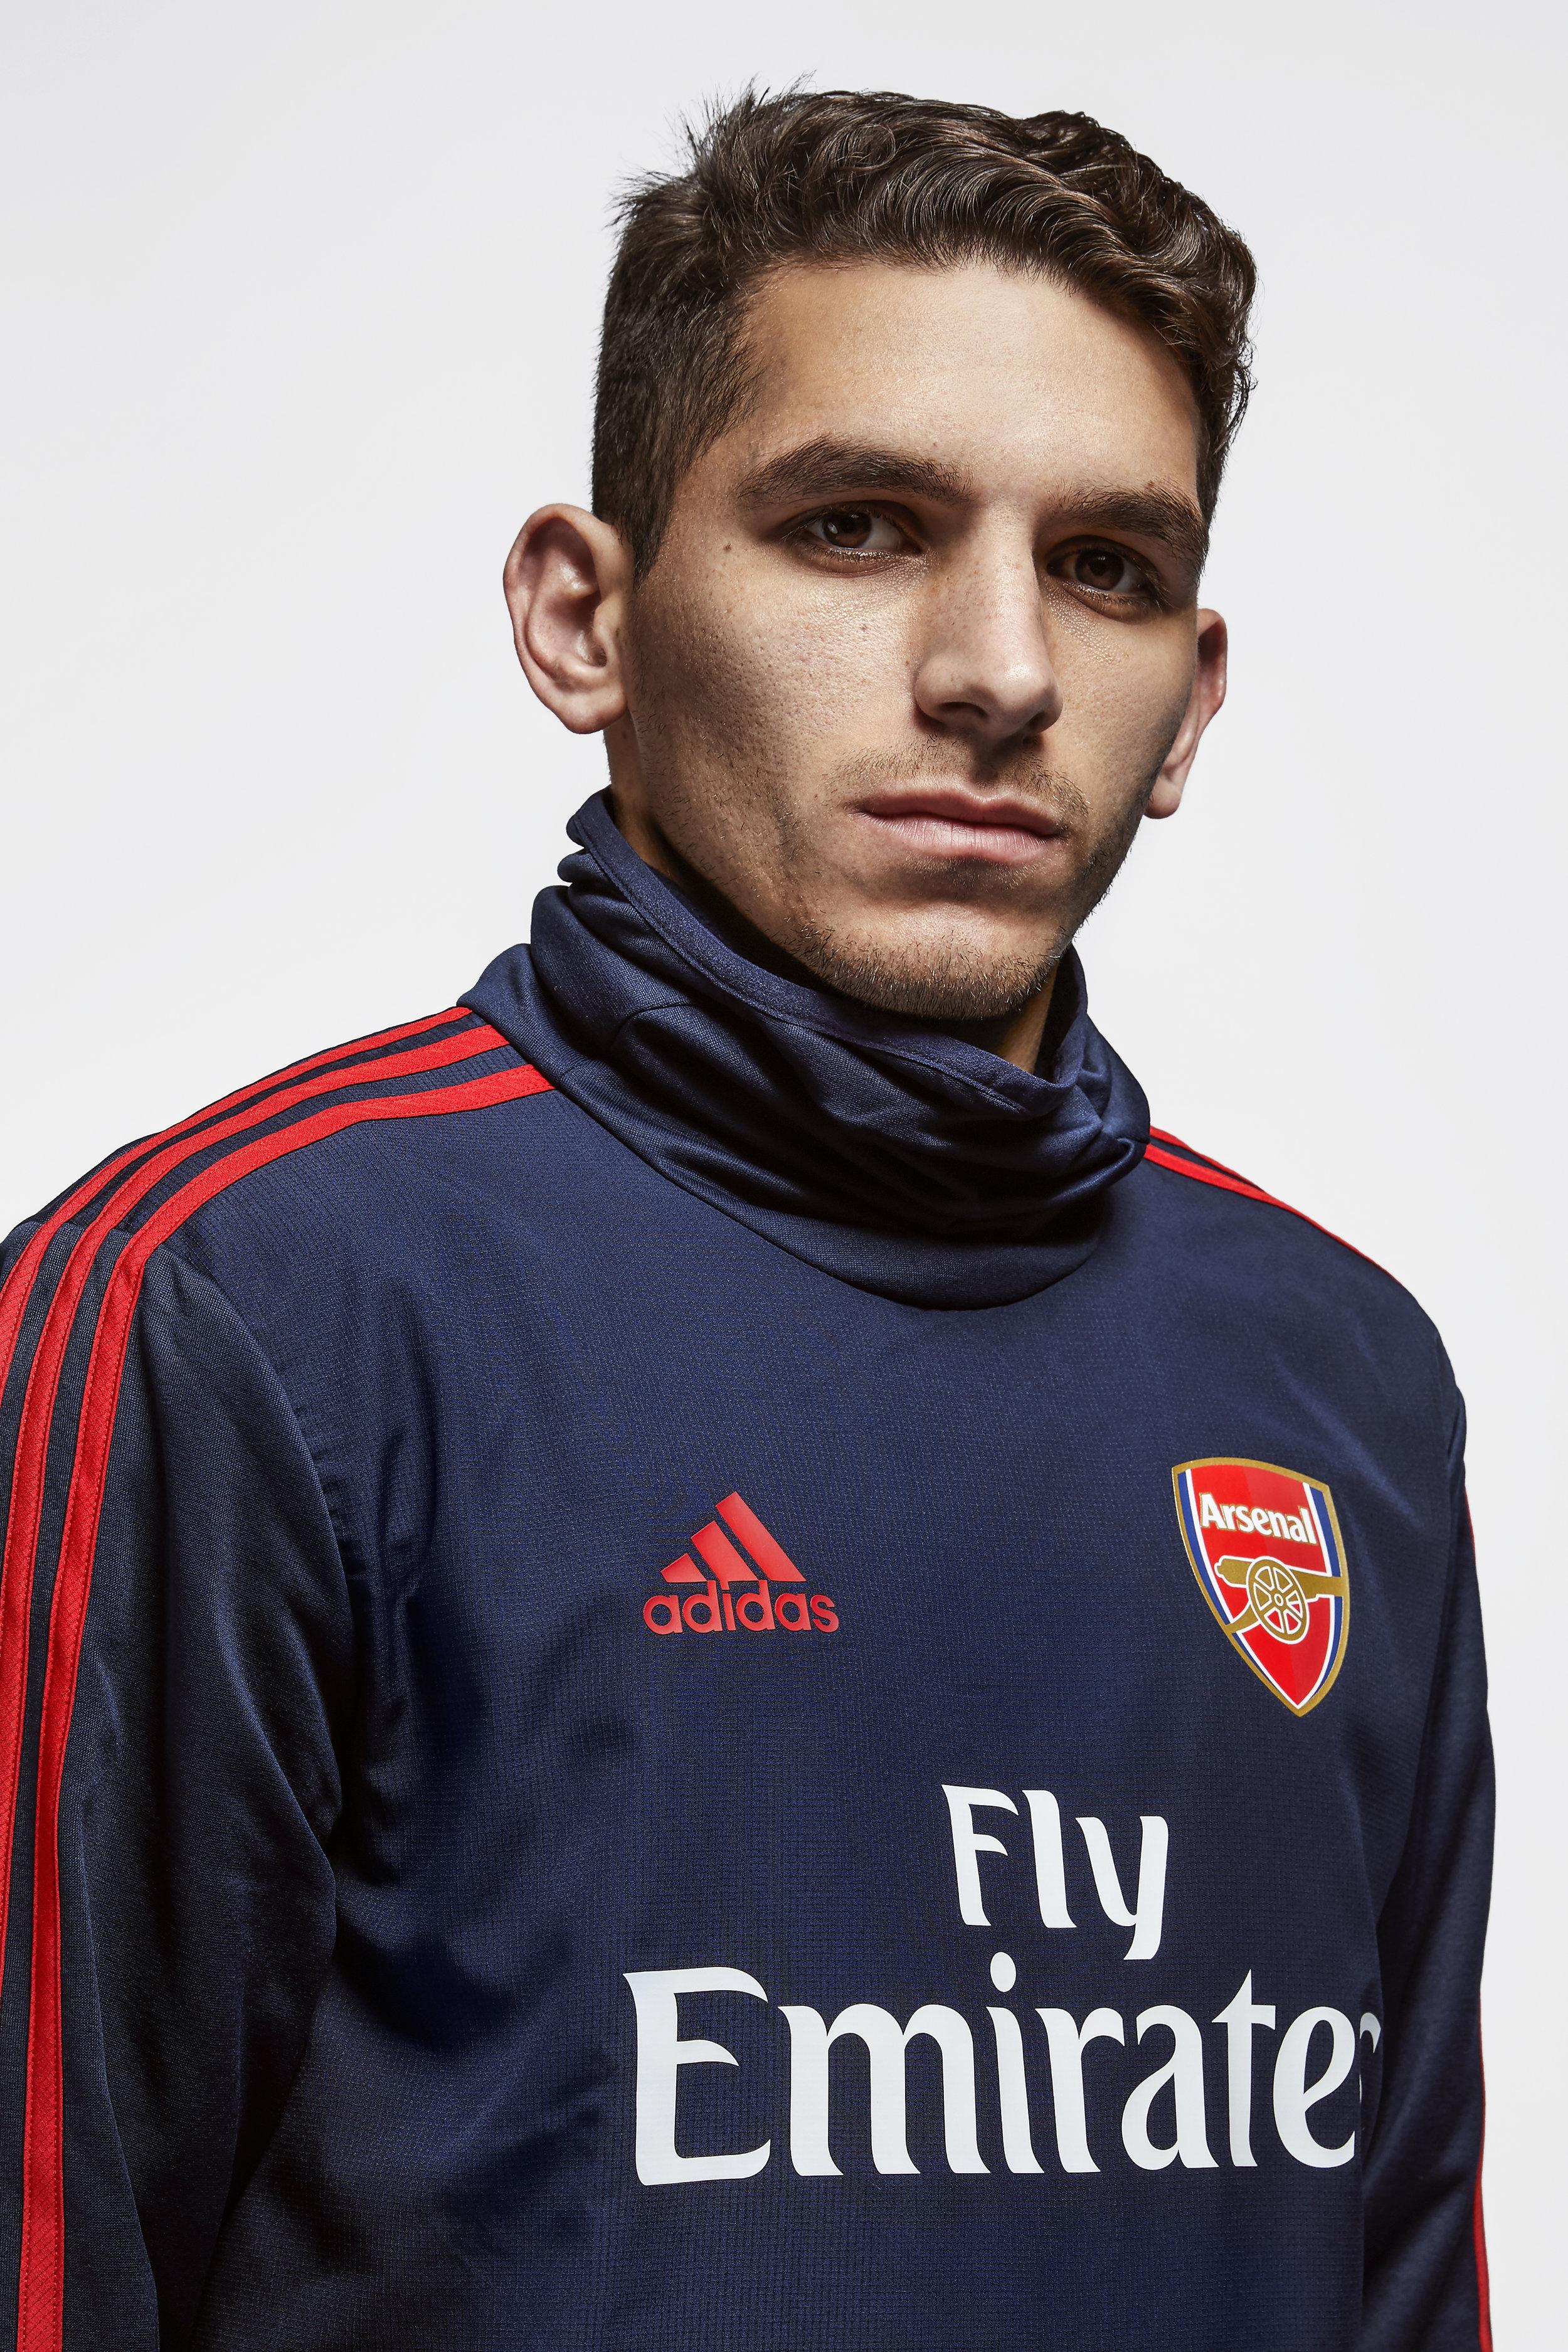 Arsenal Adidas Edited Torreira.jpg